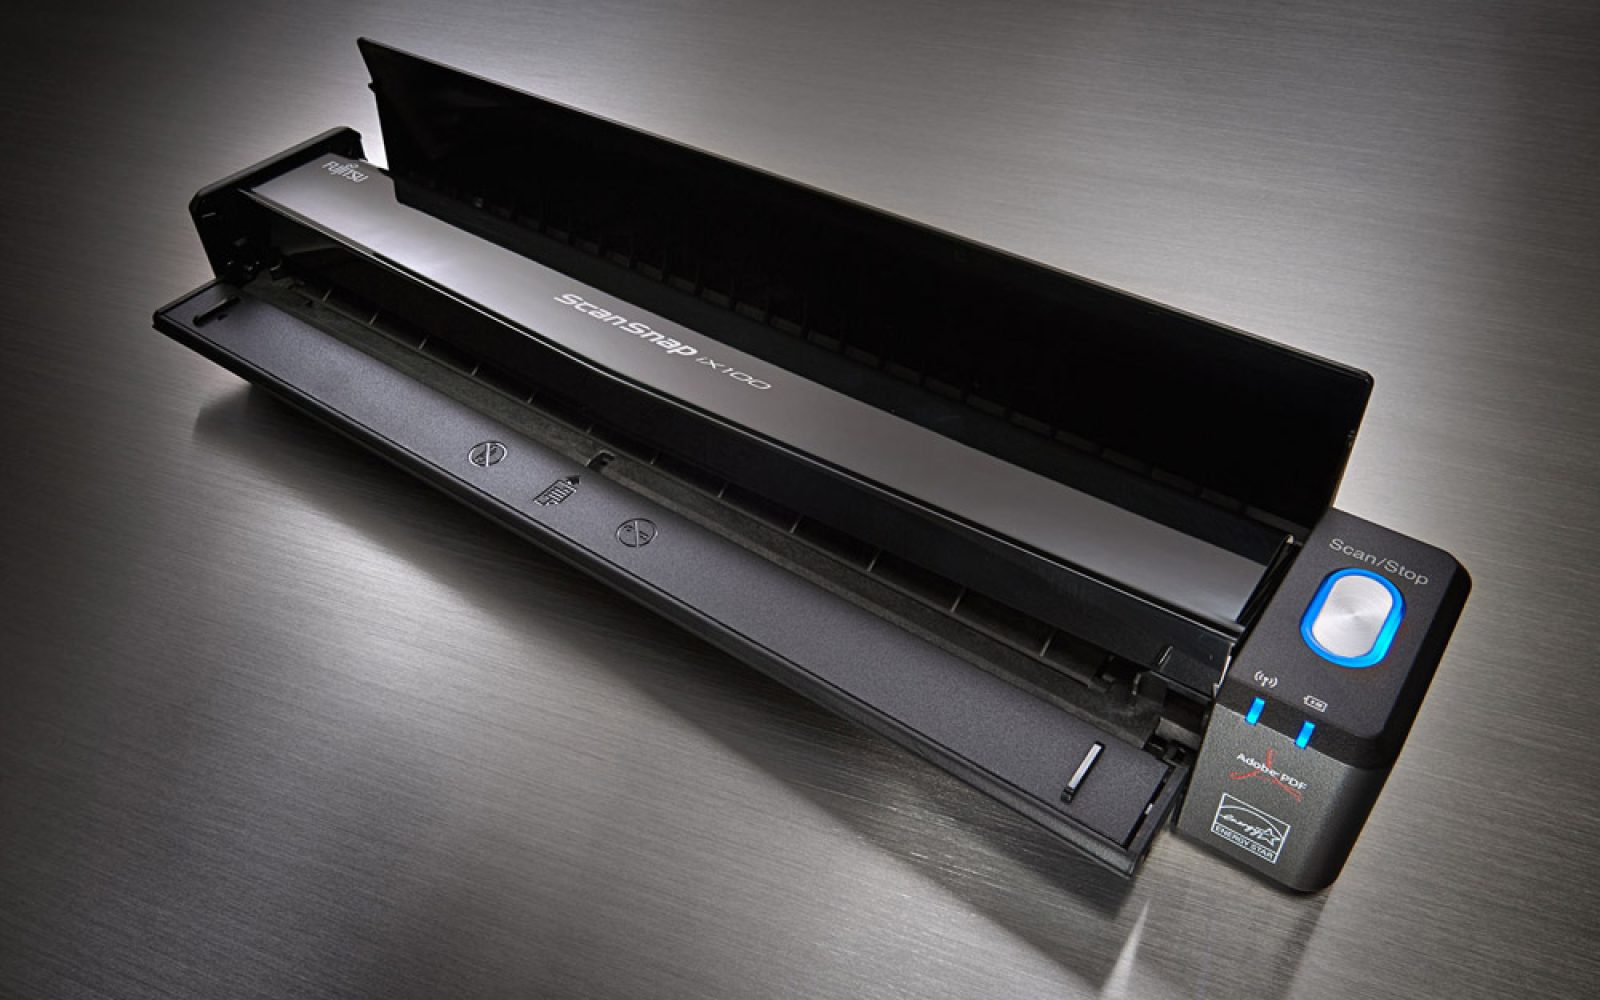 Review: Fujitsu ScanSnap iX100, a wireless ultra-compact